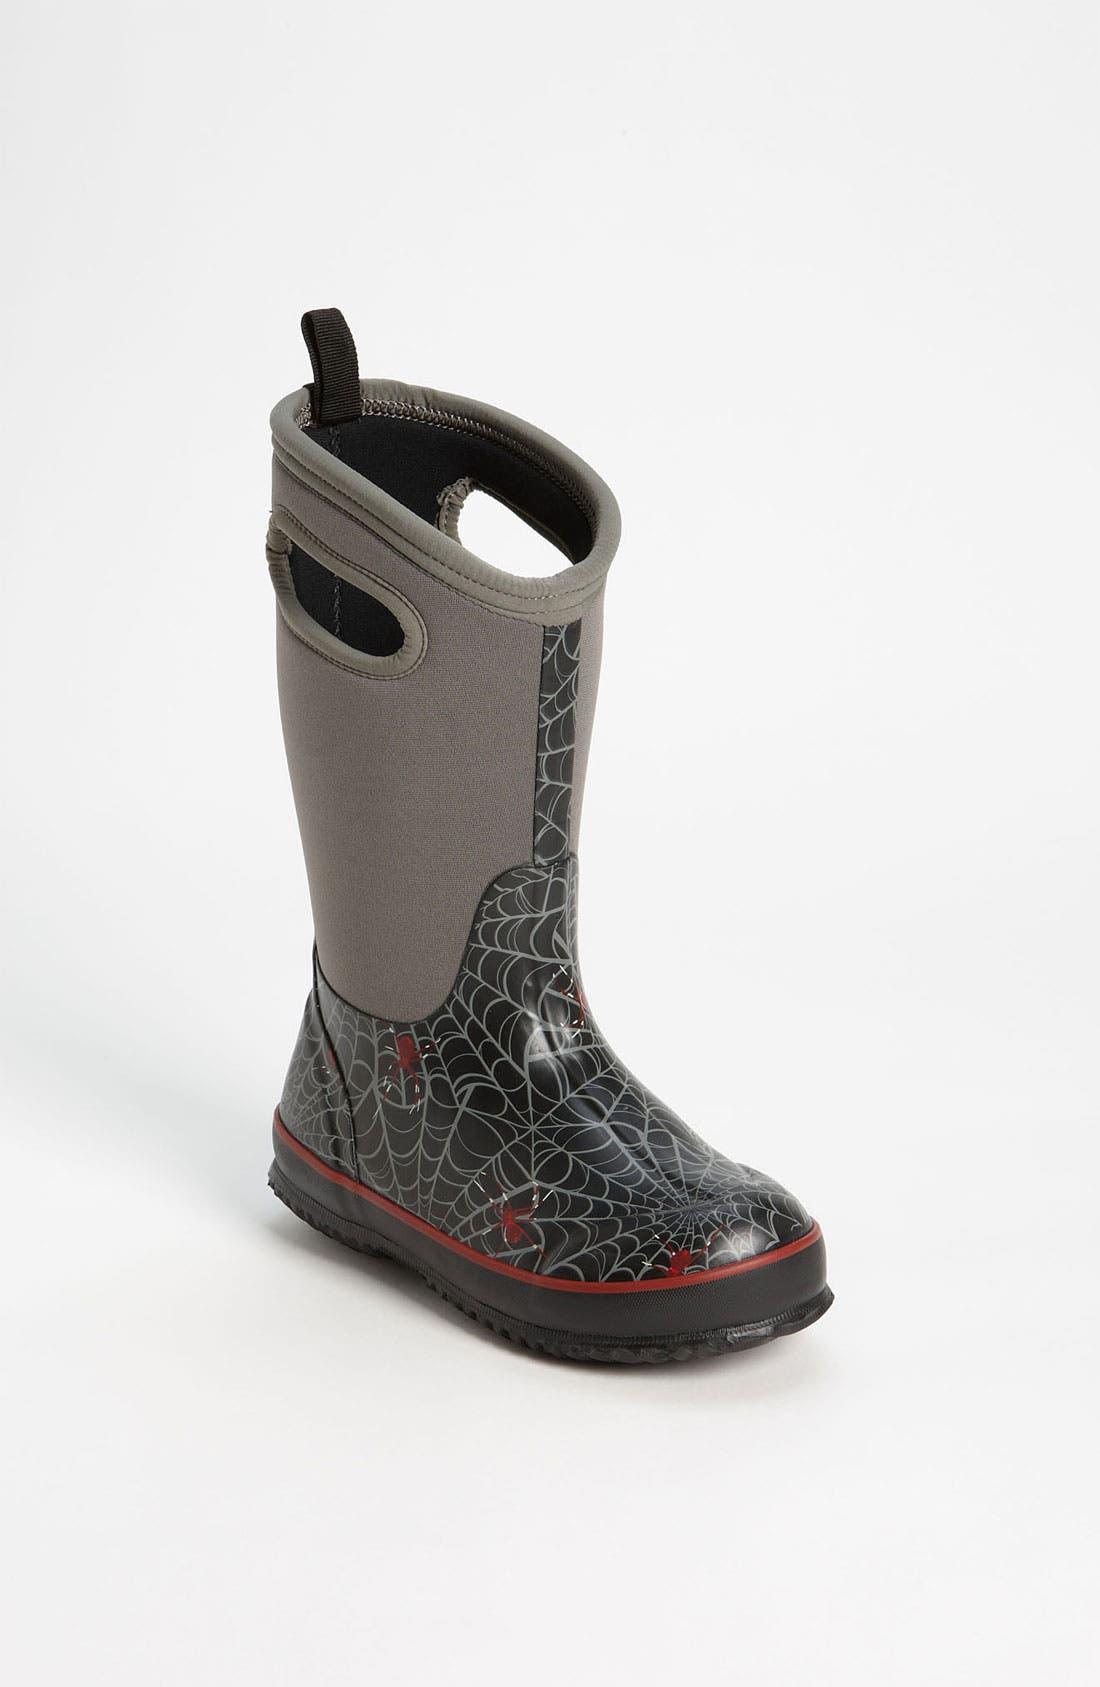 Main Image - Bogs 'Classic High - Spiders' Waterproof Boot (Toddler, Little Kid, & Big Kid)